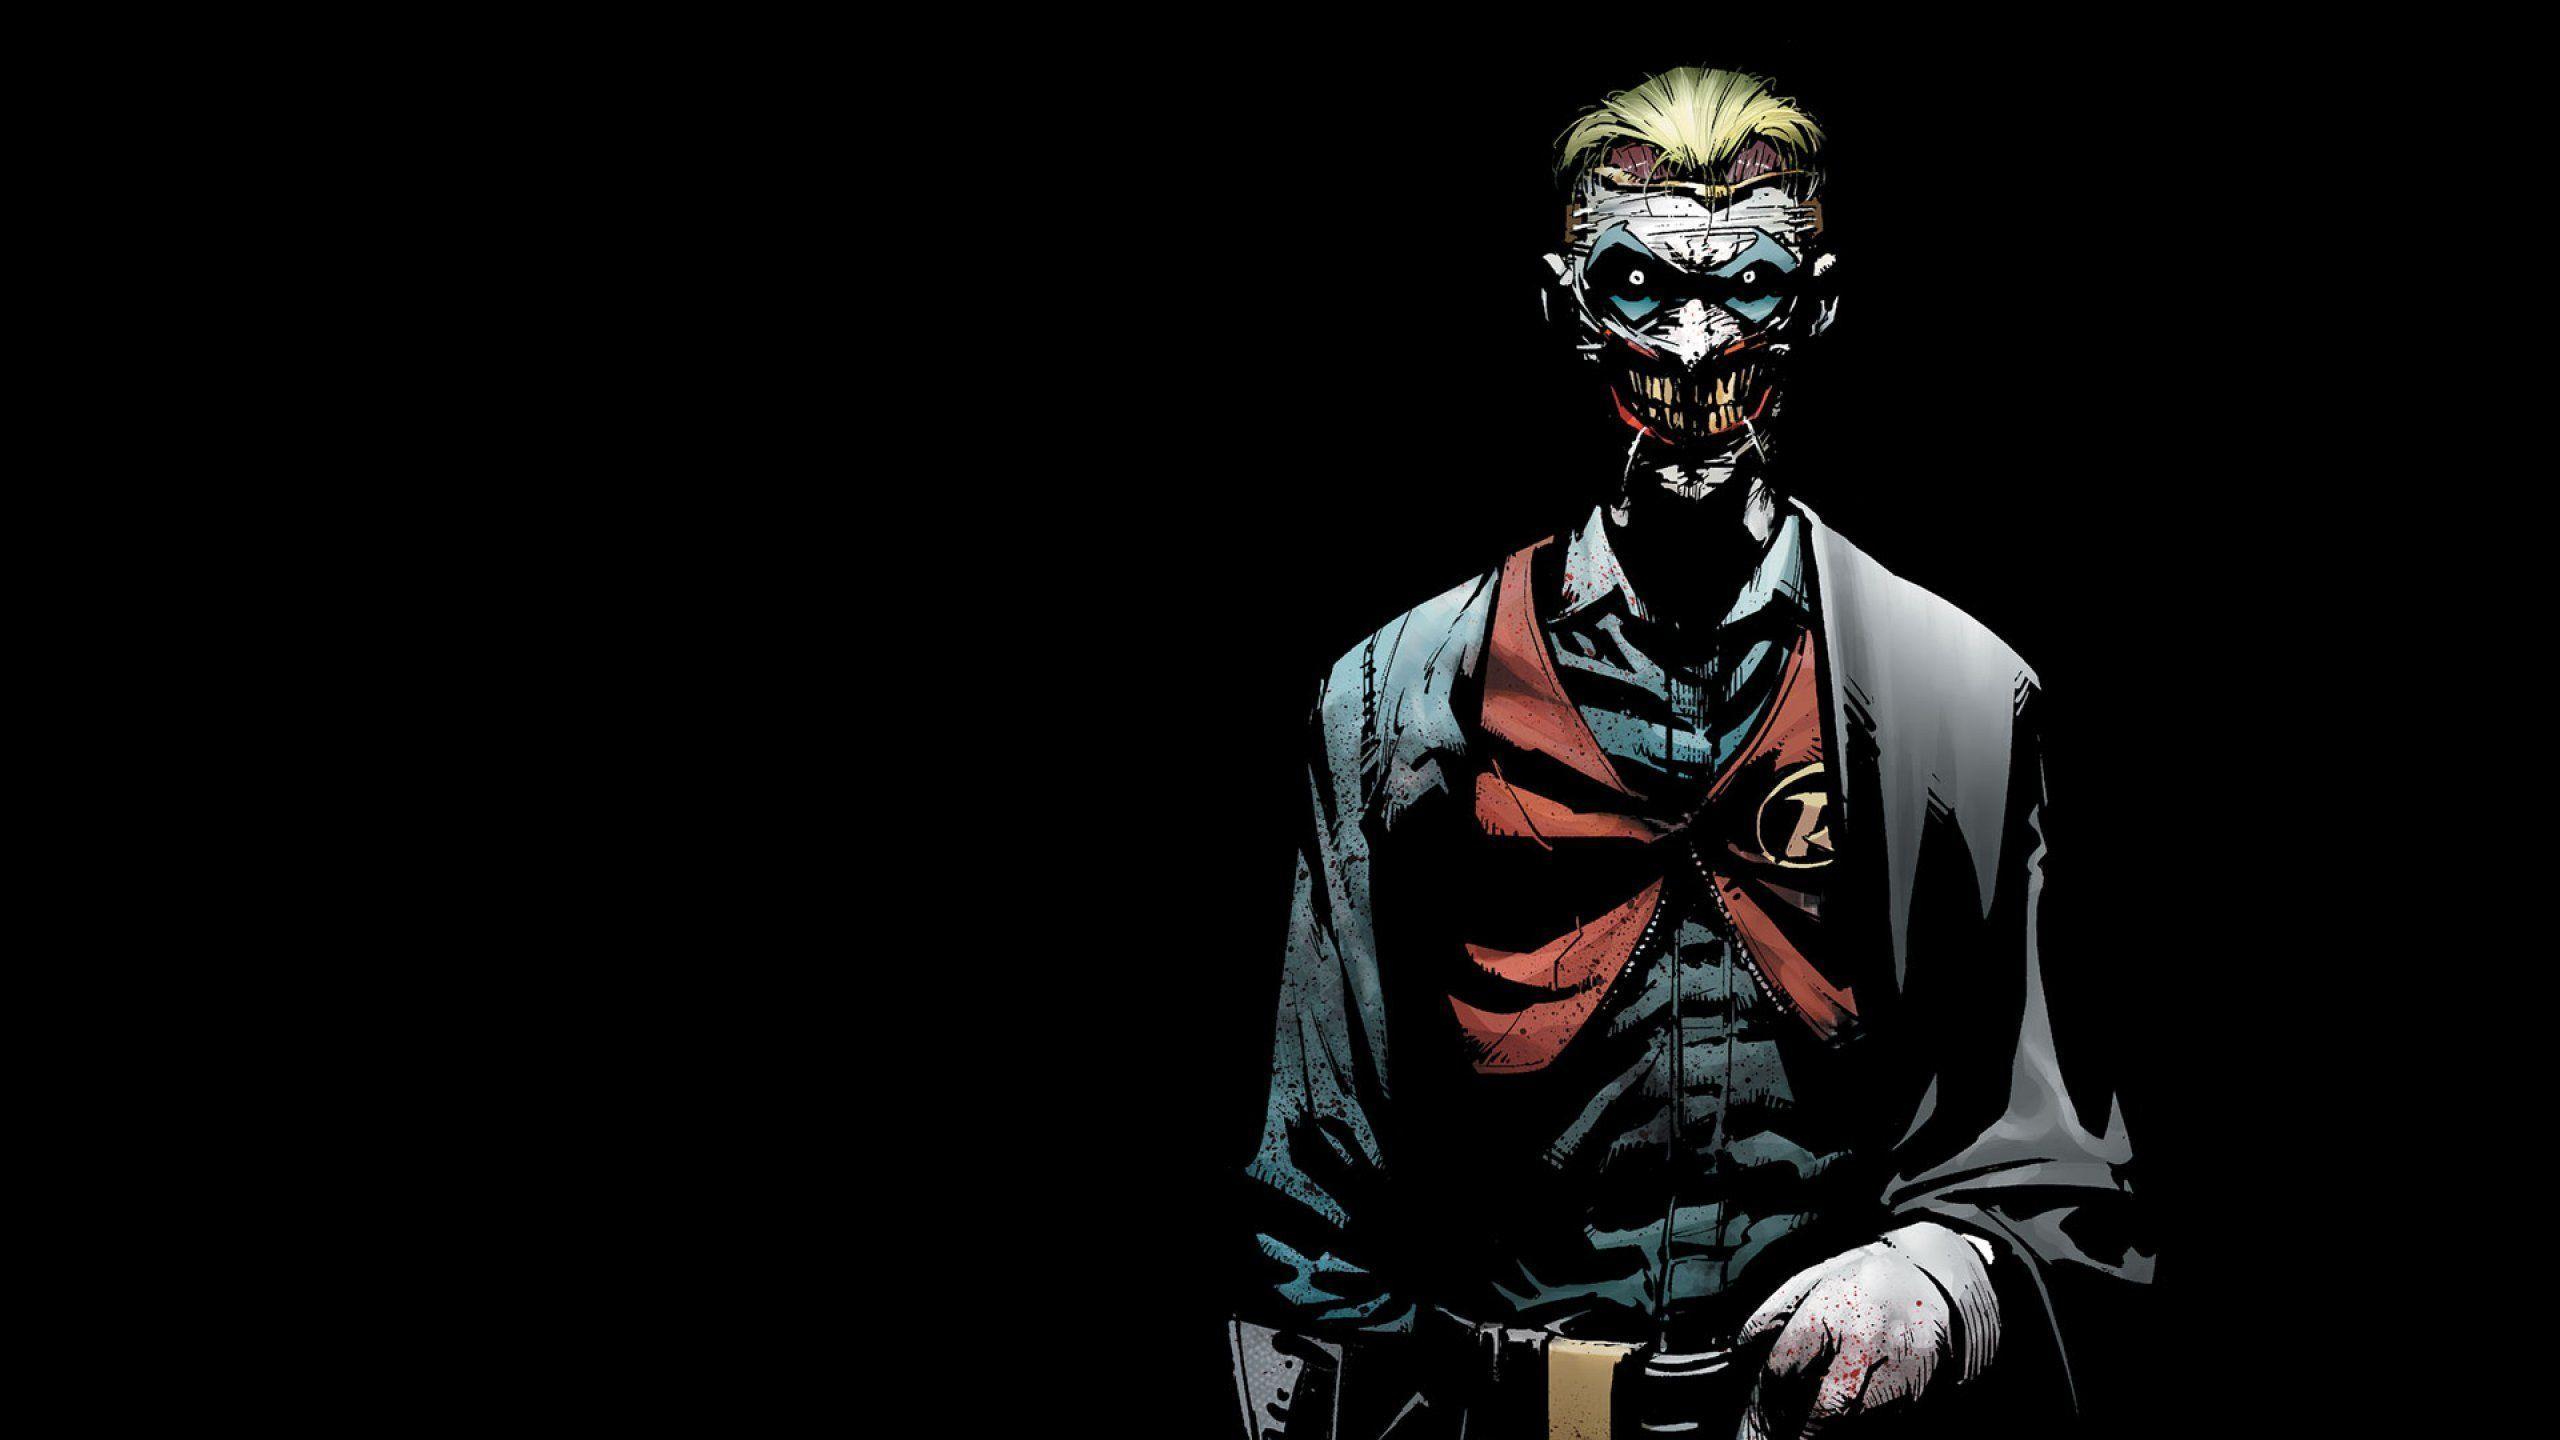 The Joker Comic Wallpapers - Top Free The Joker Comic ...